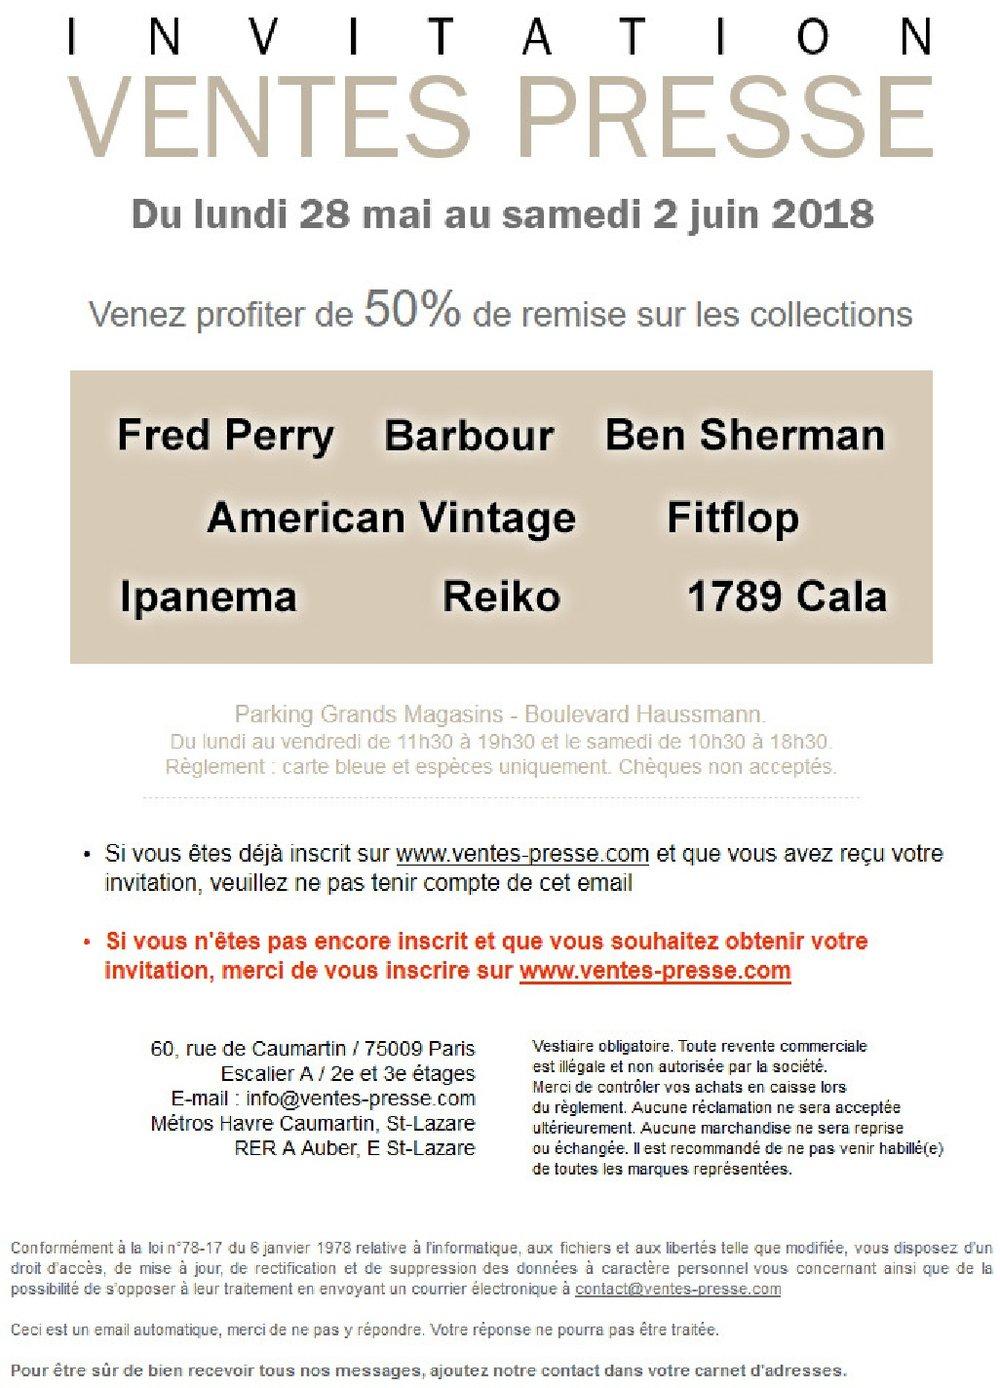 Bon-plan-Ventes-presse-Fred-Perry-Barbour-Ben-Sherman-American-vintage-Fitflop-Ipanema-reiko-1789cala.jpg